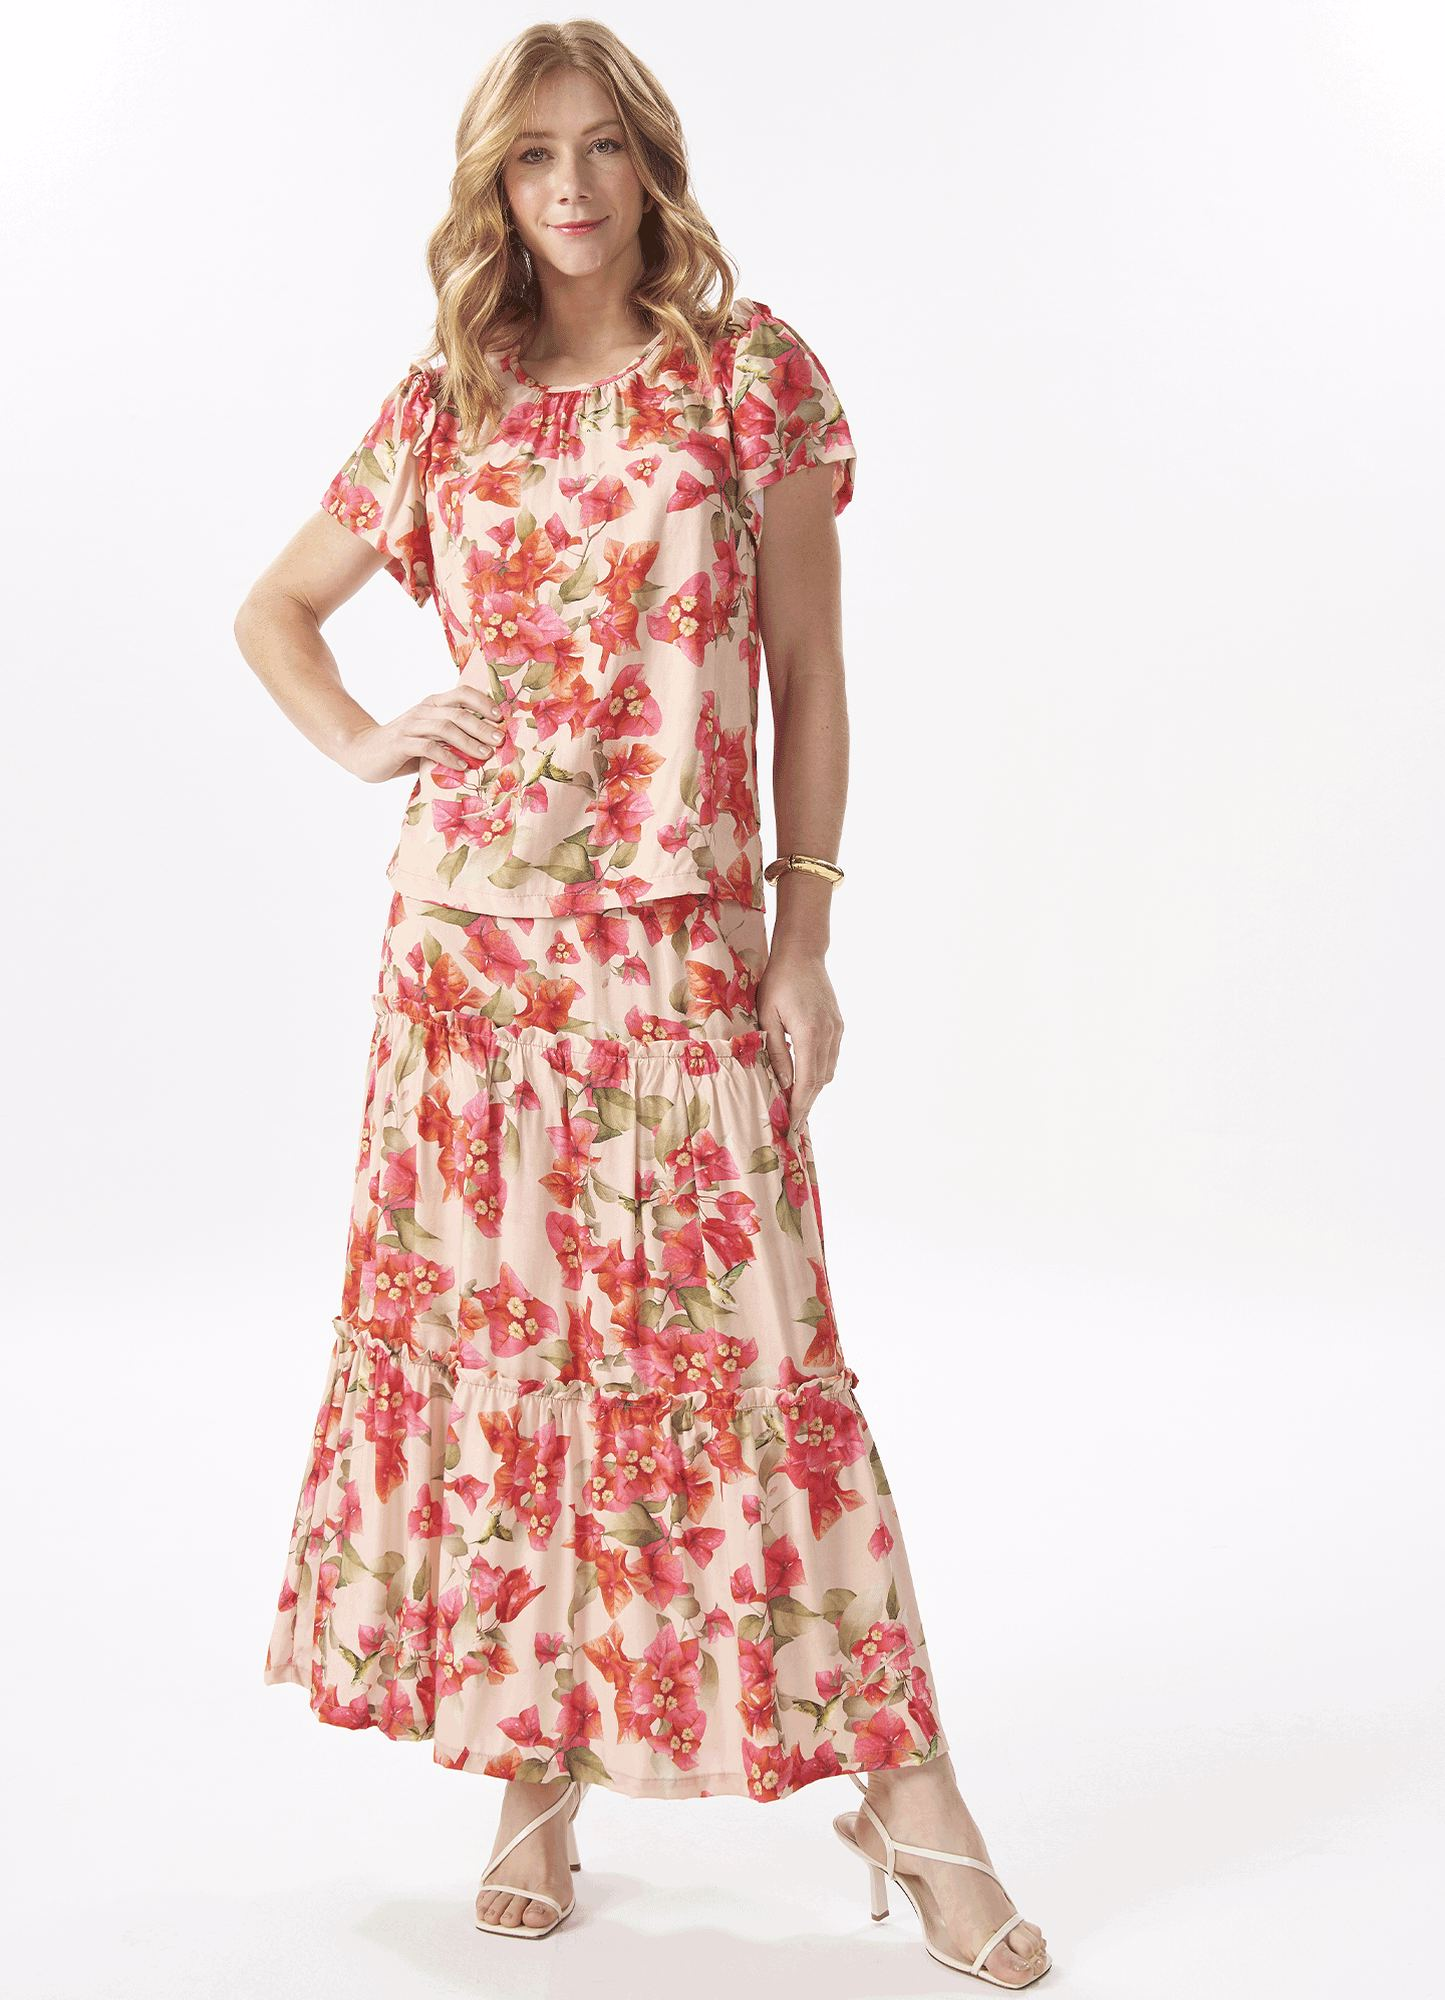 Conjunto Feminino Tecido Estampa Floral Blusa e Saia Longa